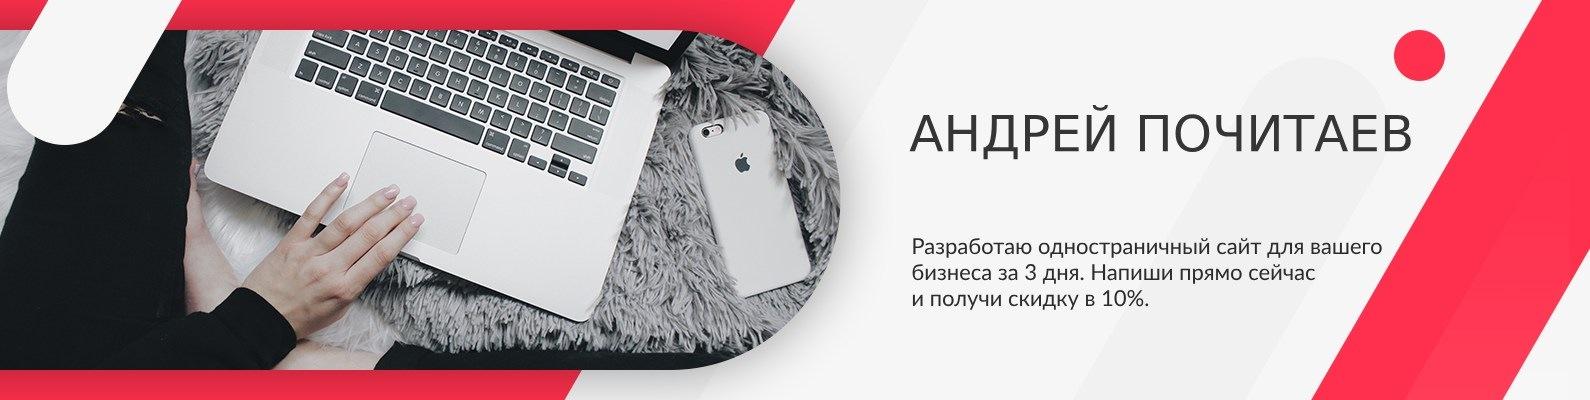 Фрилансер редактирование freelance jobs for translators